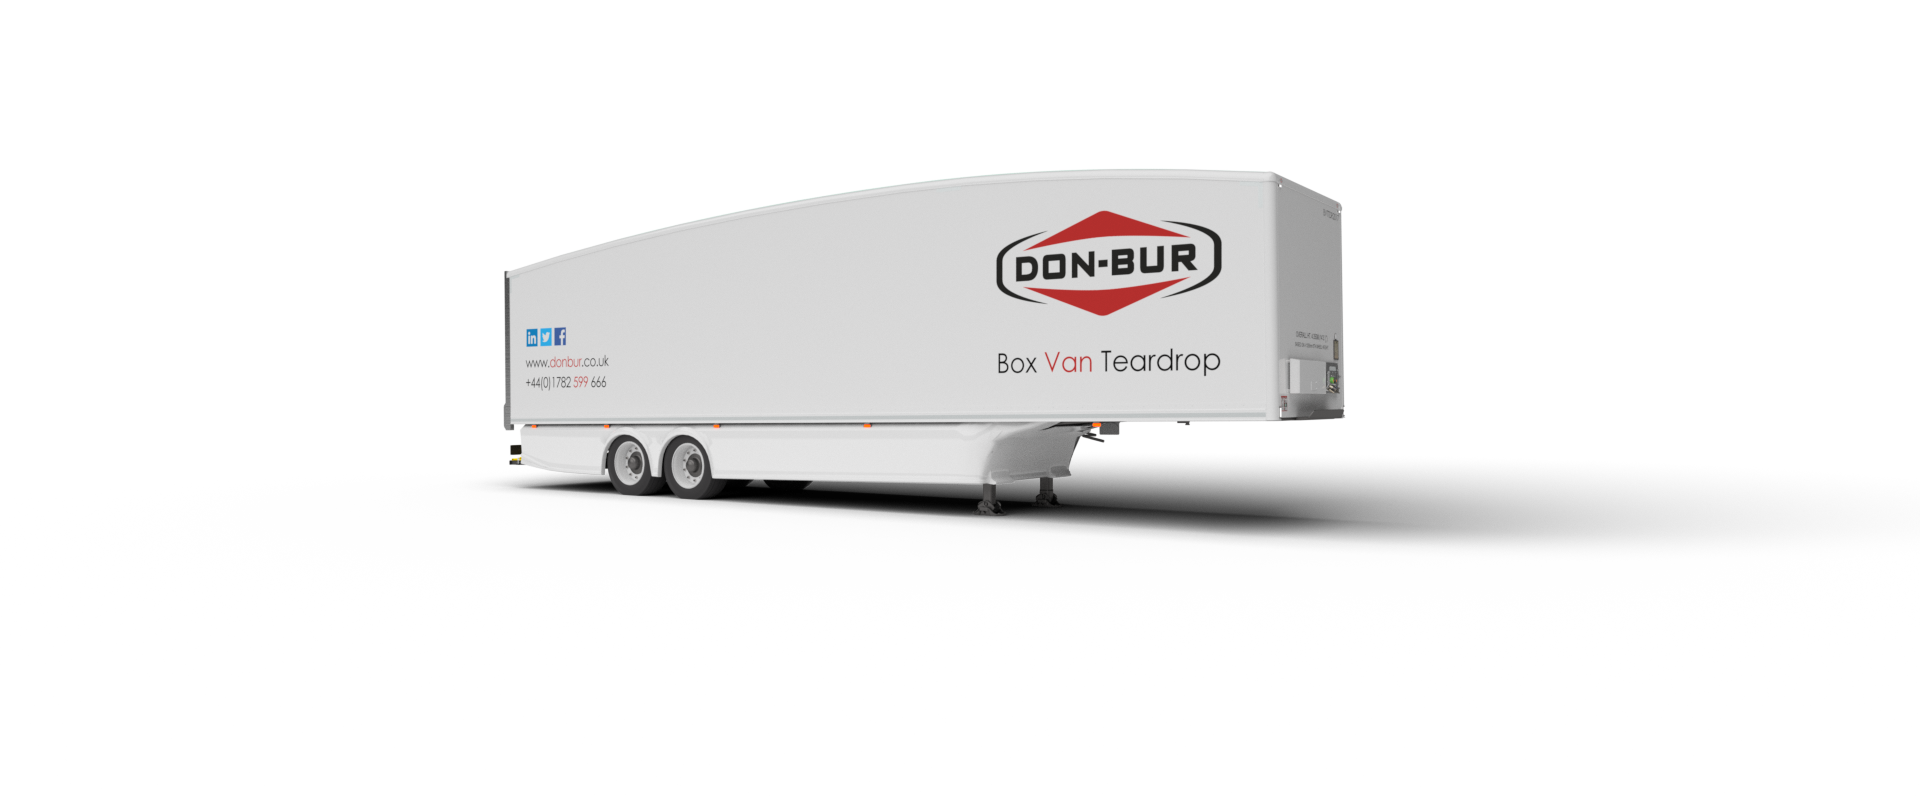 Aerodynamic Box Van Teardrop Trailer Open